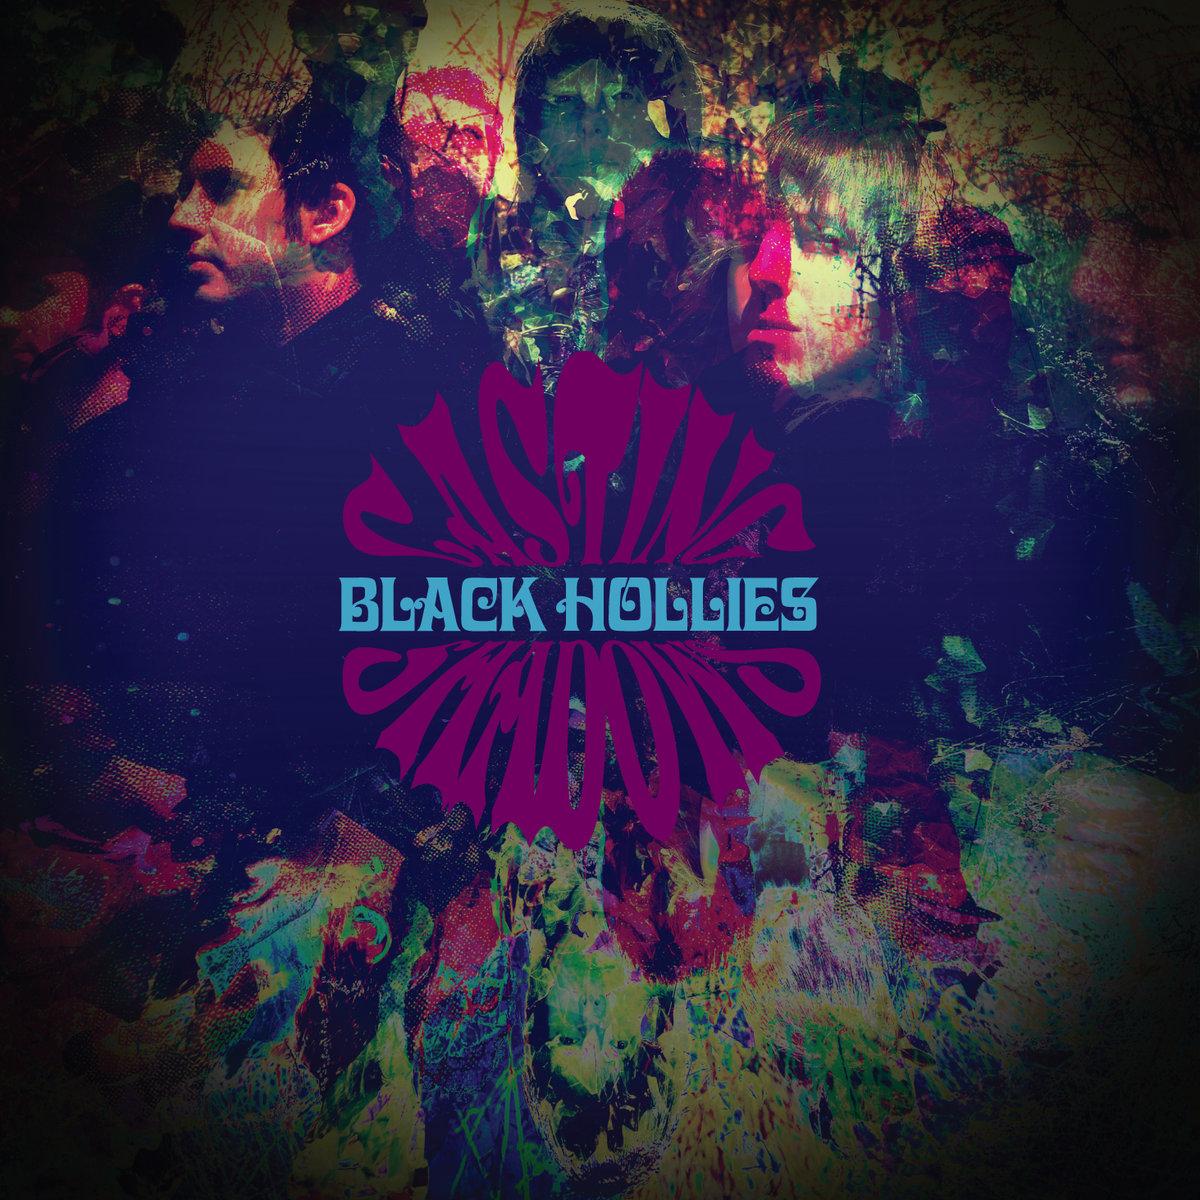 The Black Hollies - Casting Shadows